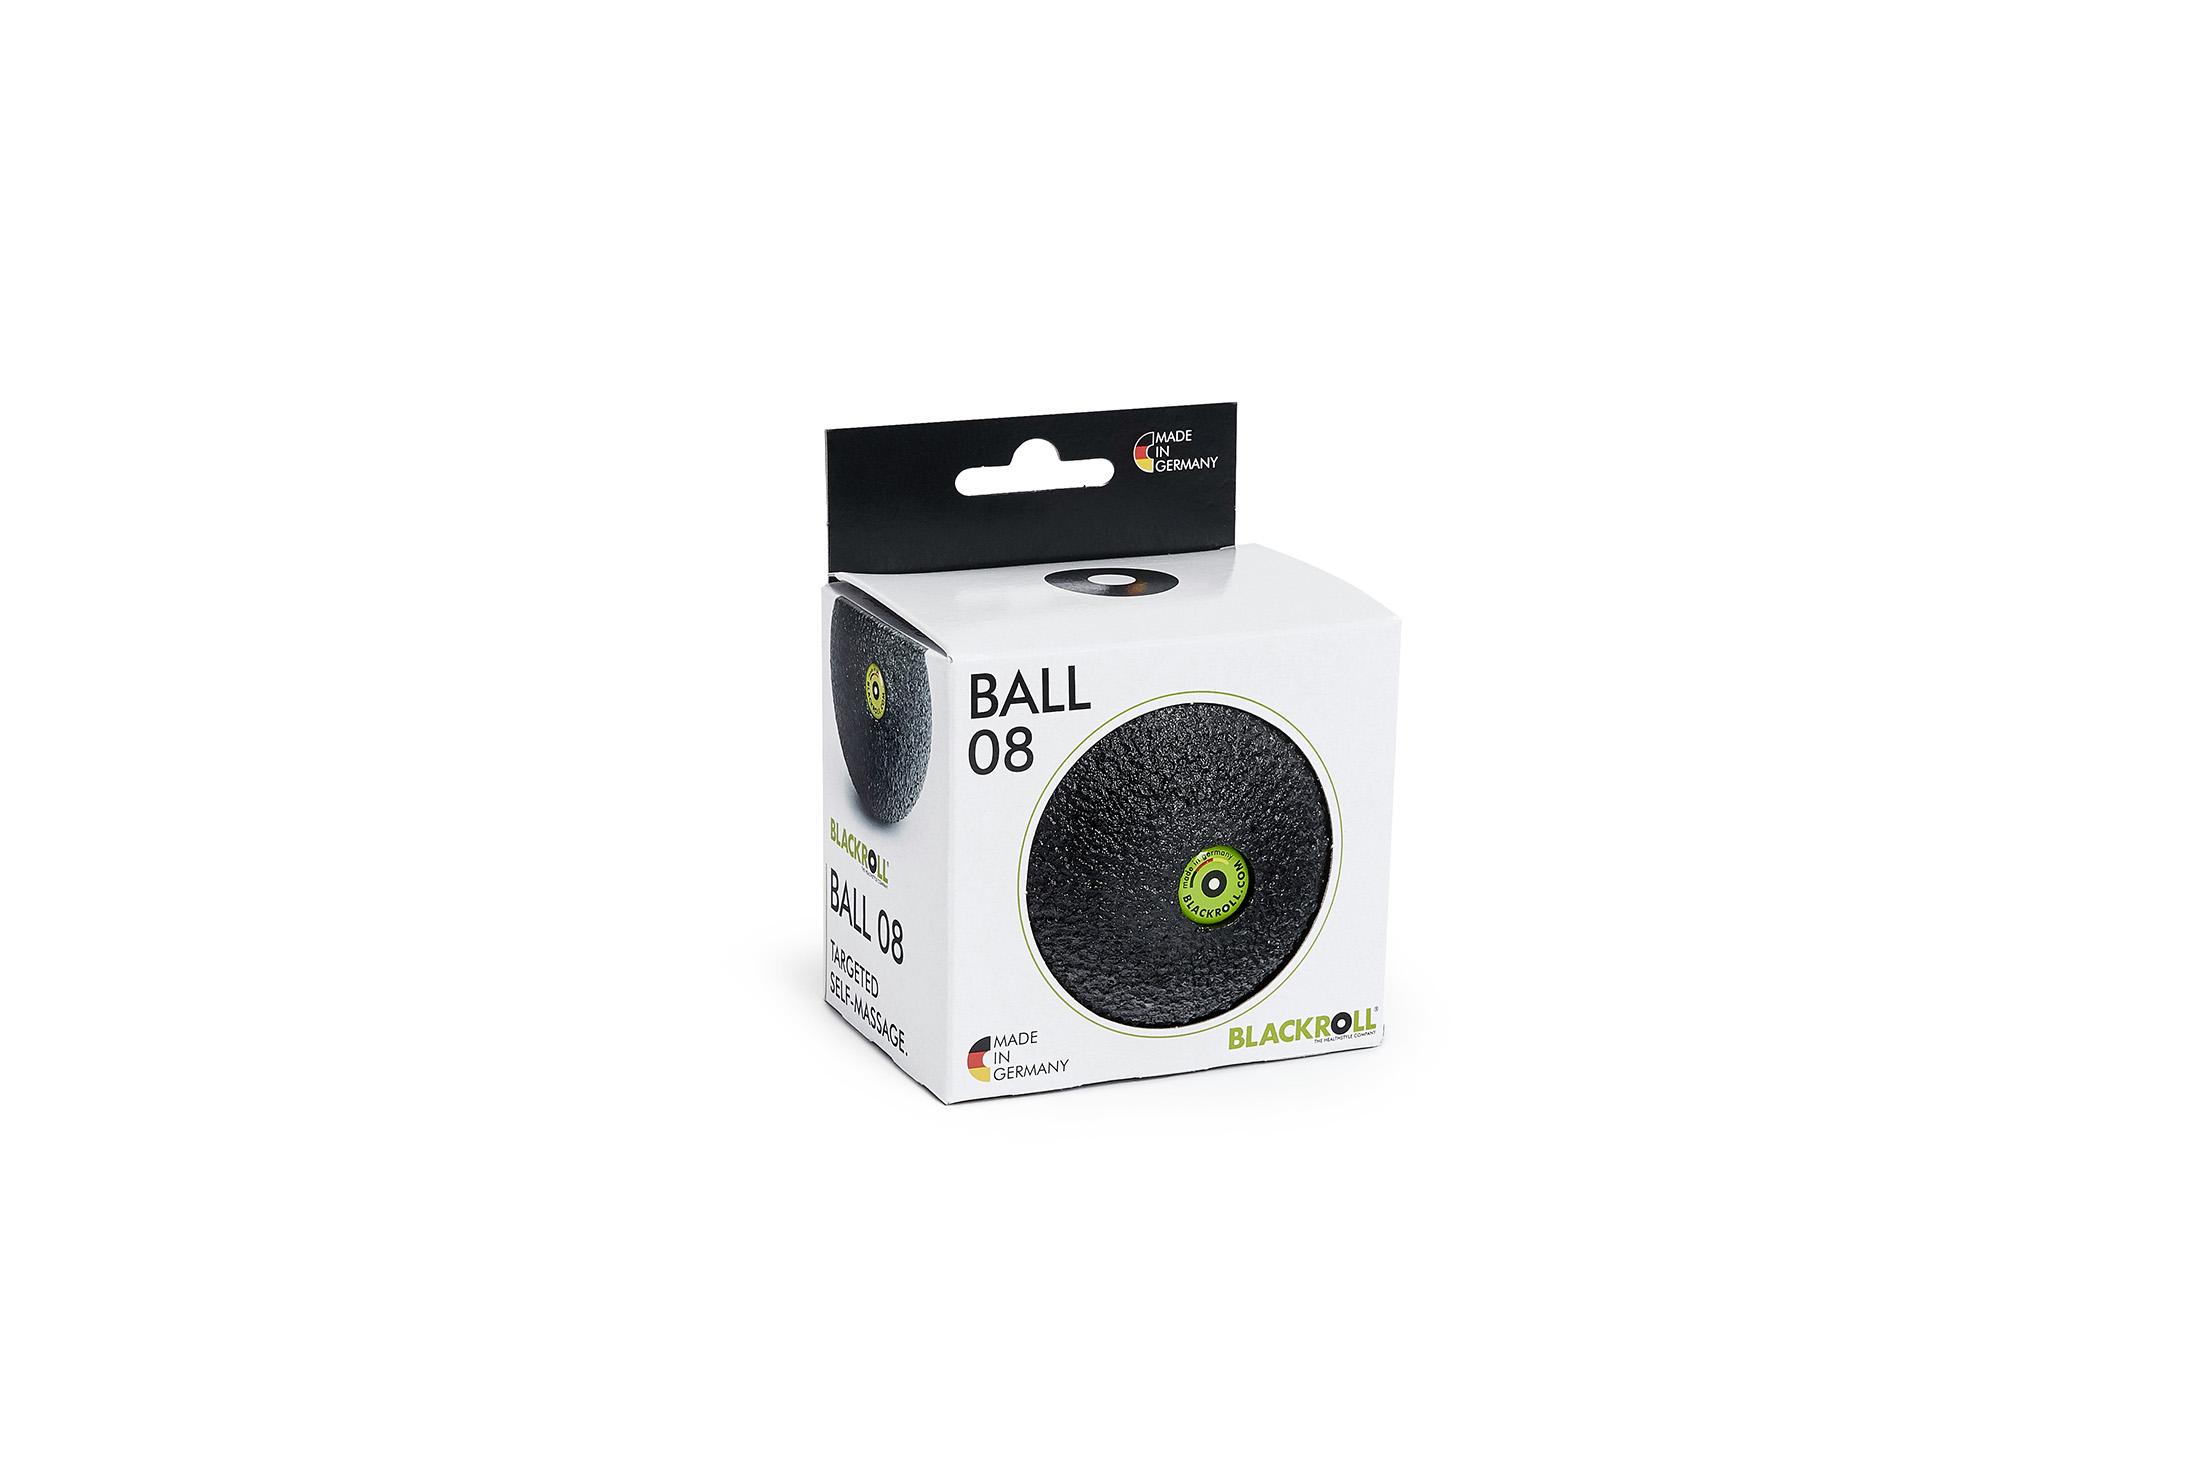 BLACKROLL® BALL 08 black - boxed incl. doming